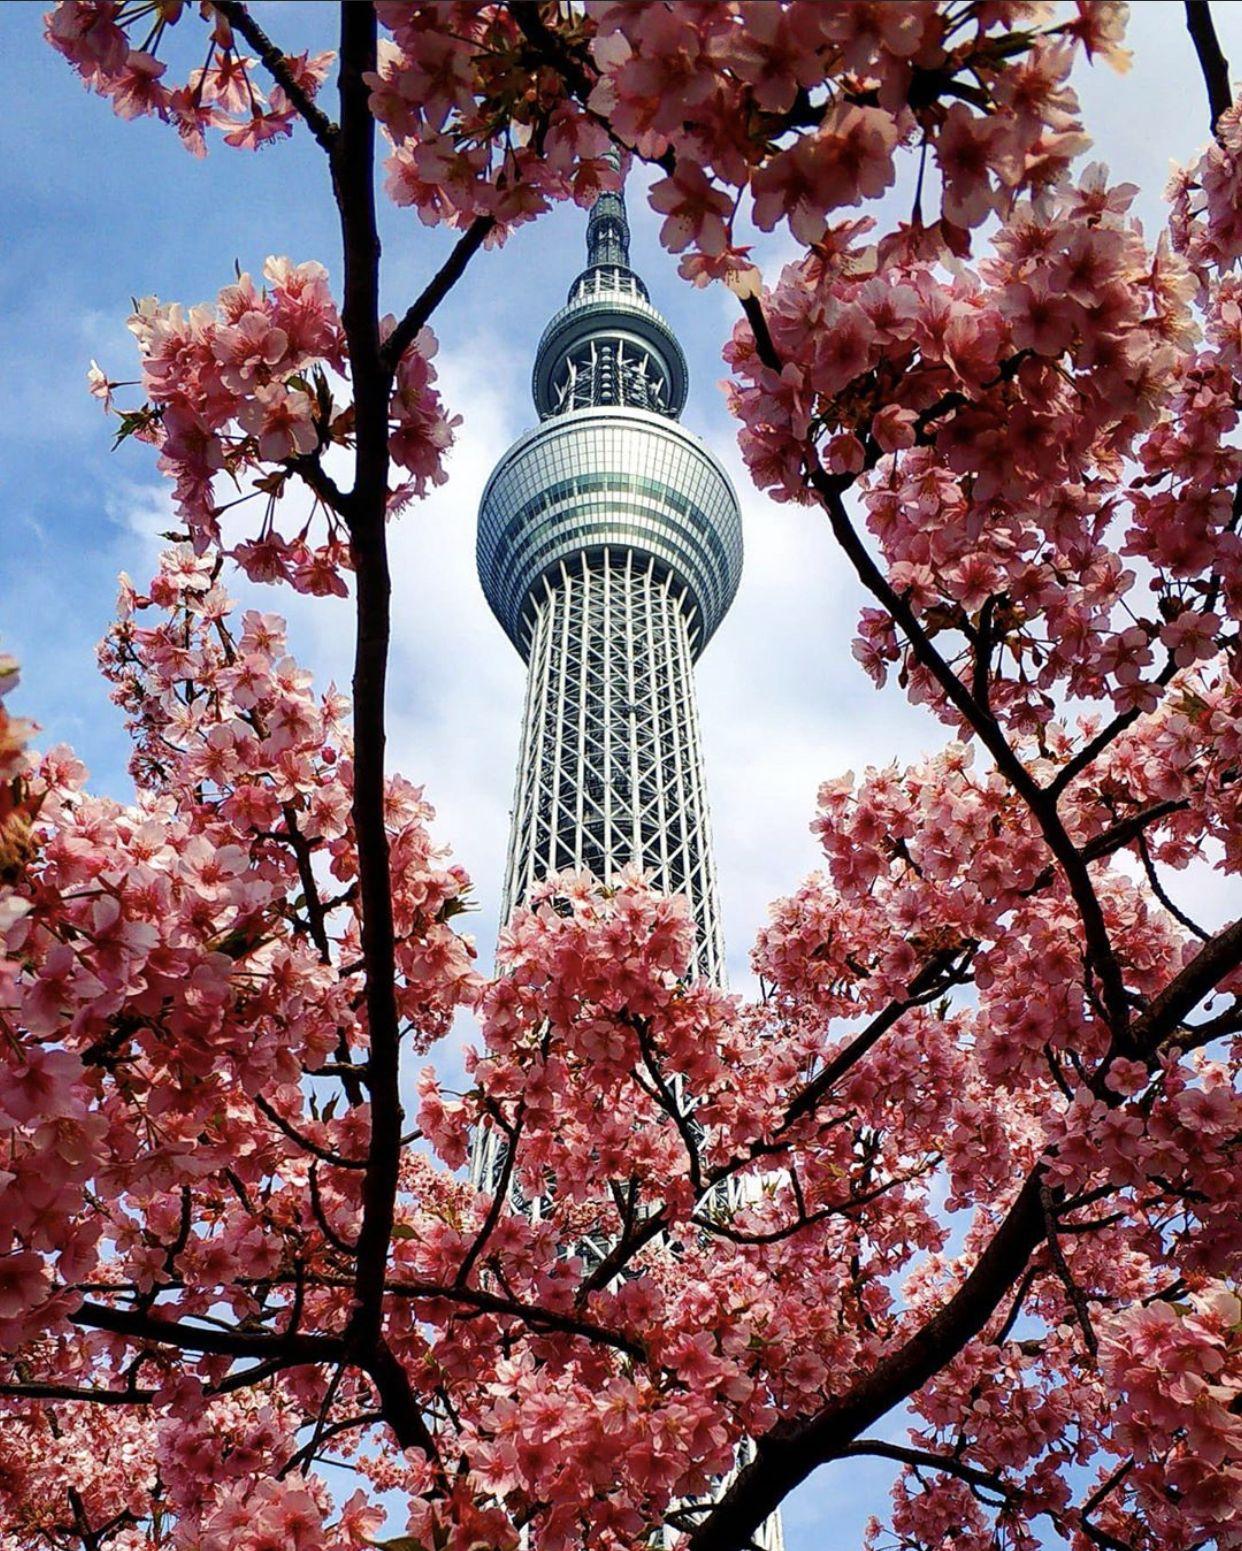 Sakura Japan Guide To Enjoy The Cherry Blossom Festival Spring 2021 Japan Cherry Blossom Festival Cherry Blossom Festival Cherry Blossom